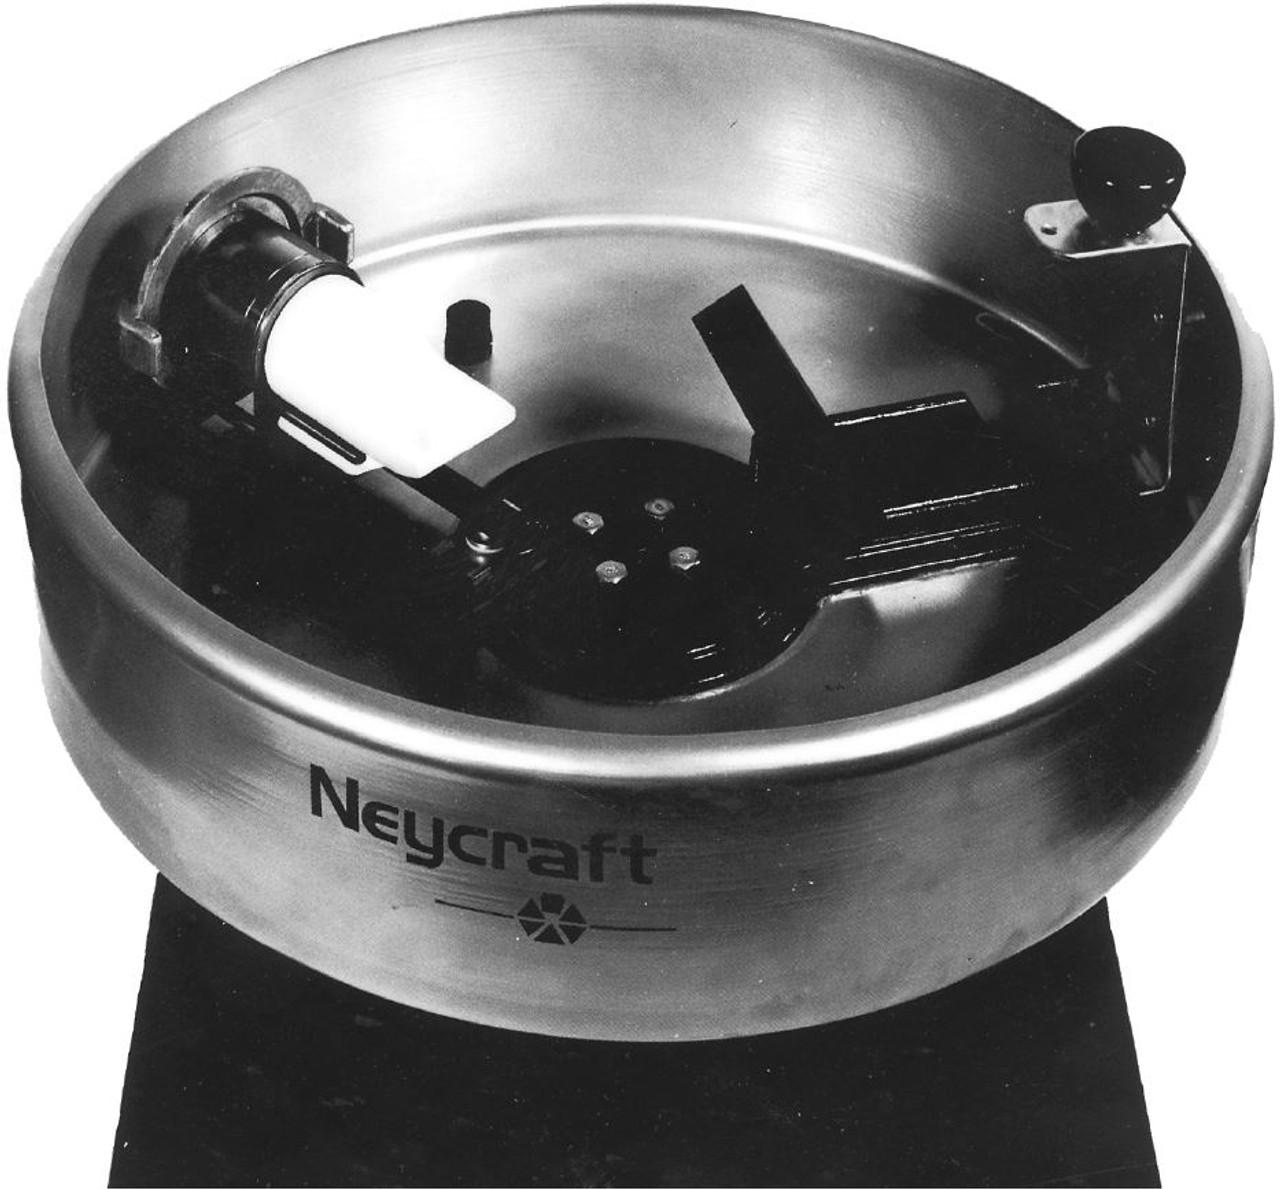 Neycraft™ centrifugal casting machine